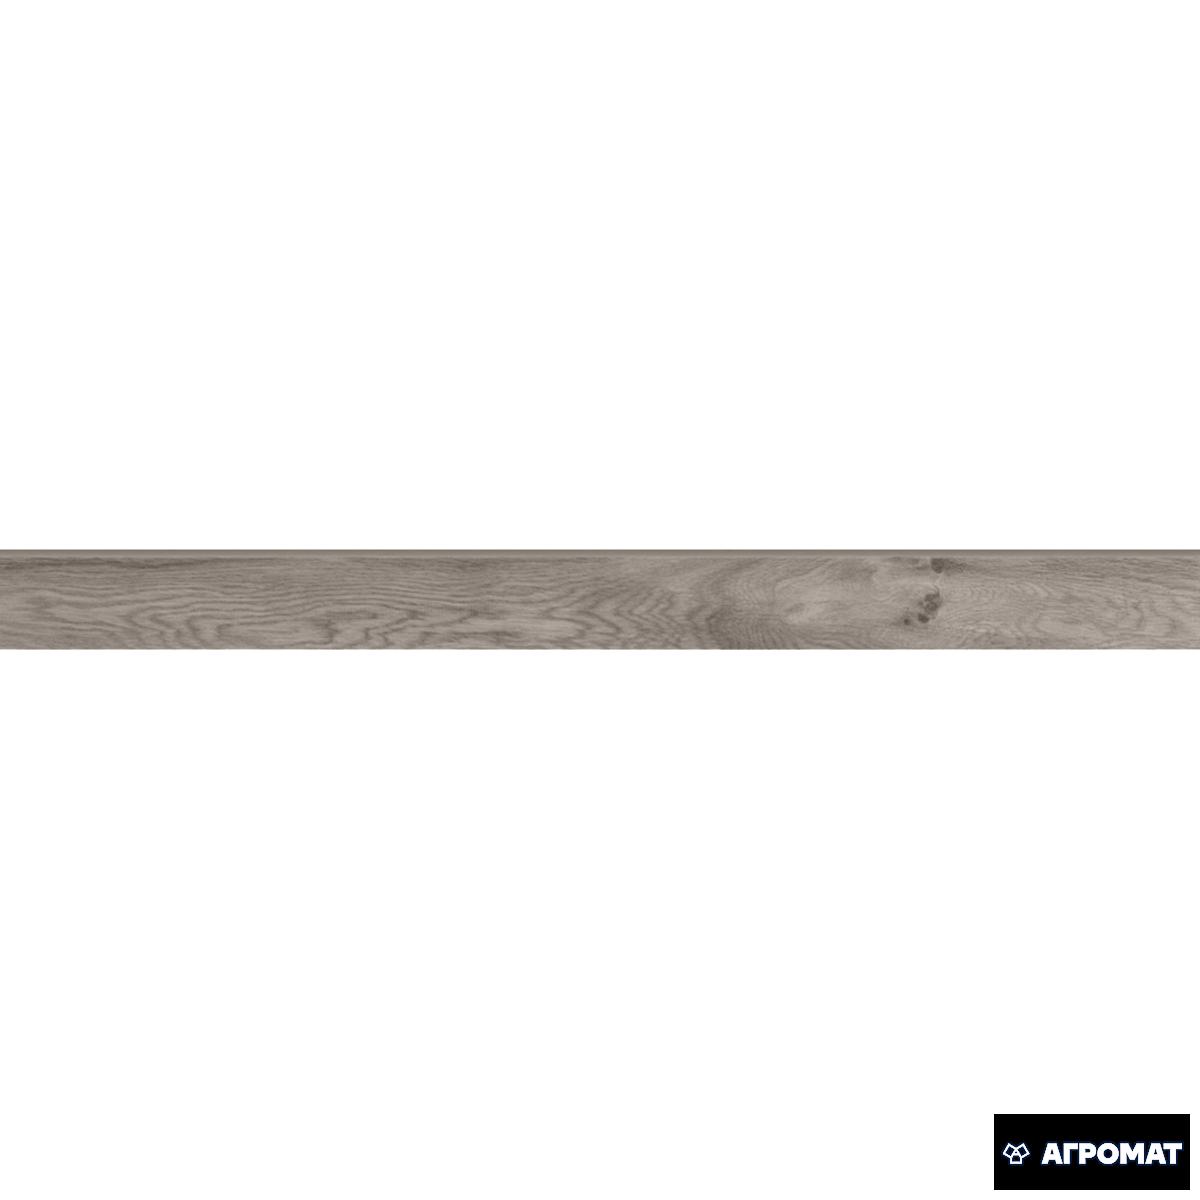 Фриз Zeus Ceramica (Зевс Керамика) Allwood ZLXWU8336